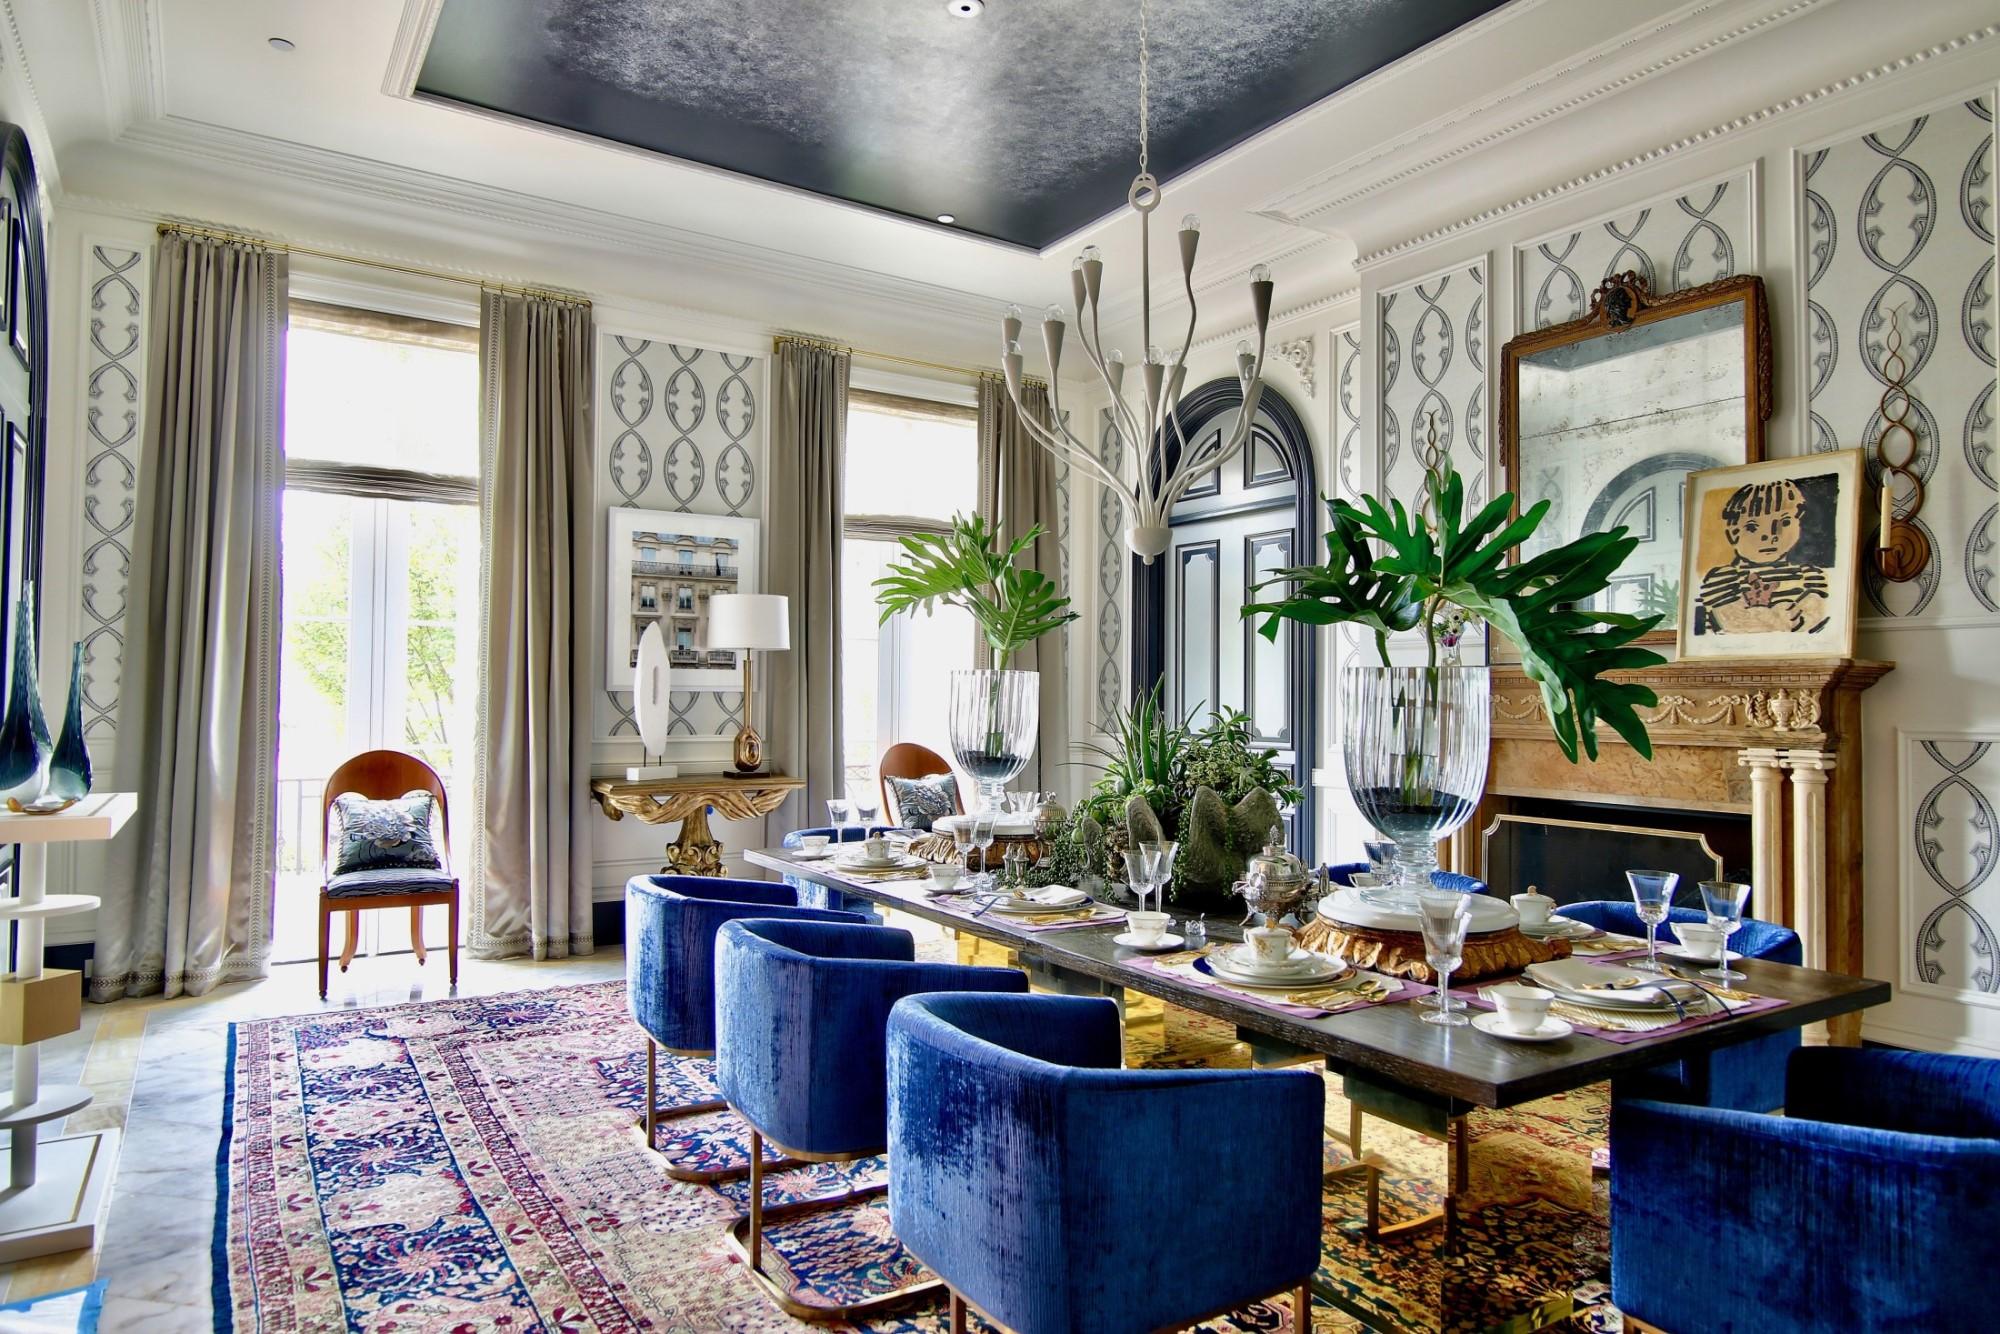 Susan_Jamieson_Dining-Room_2web_grasscloth.jpg